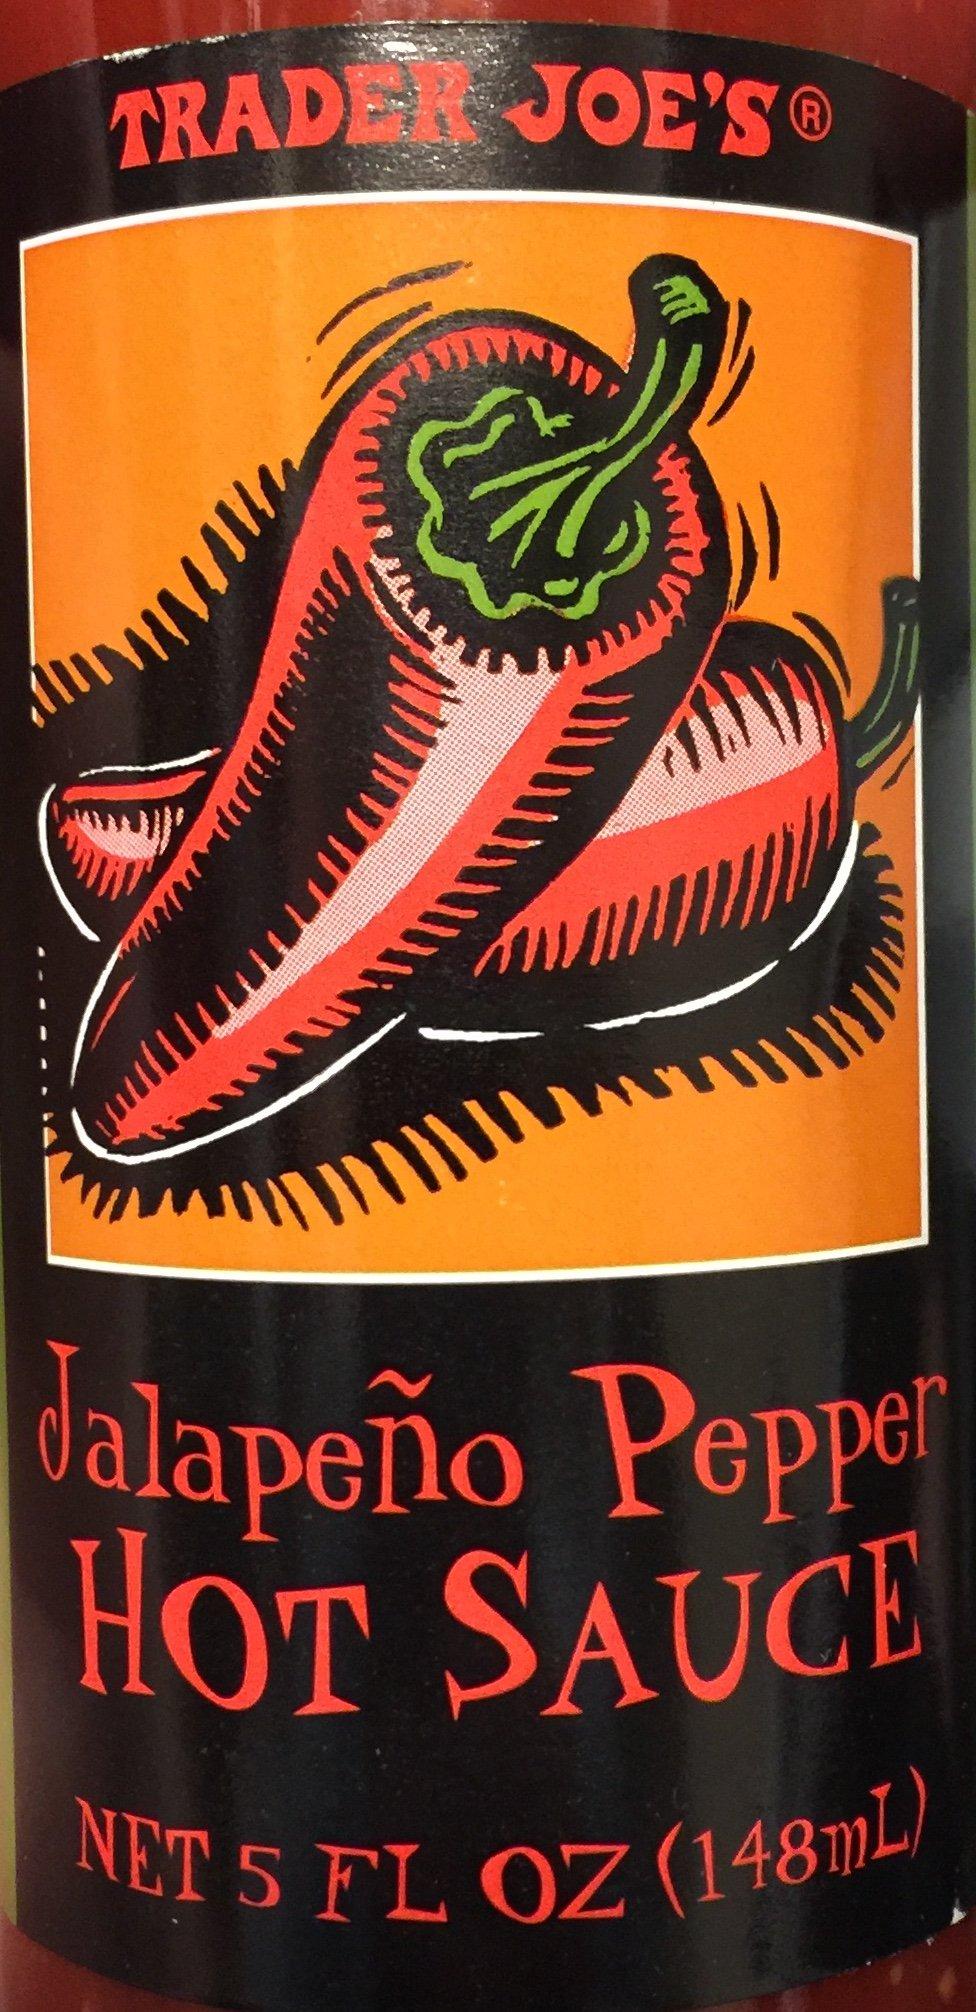 Trader Joe's Jalapeno Pepper Hot Sauce